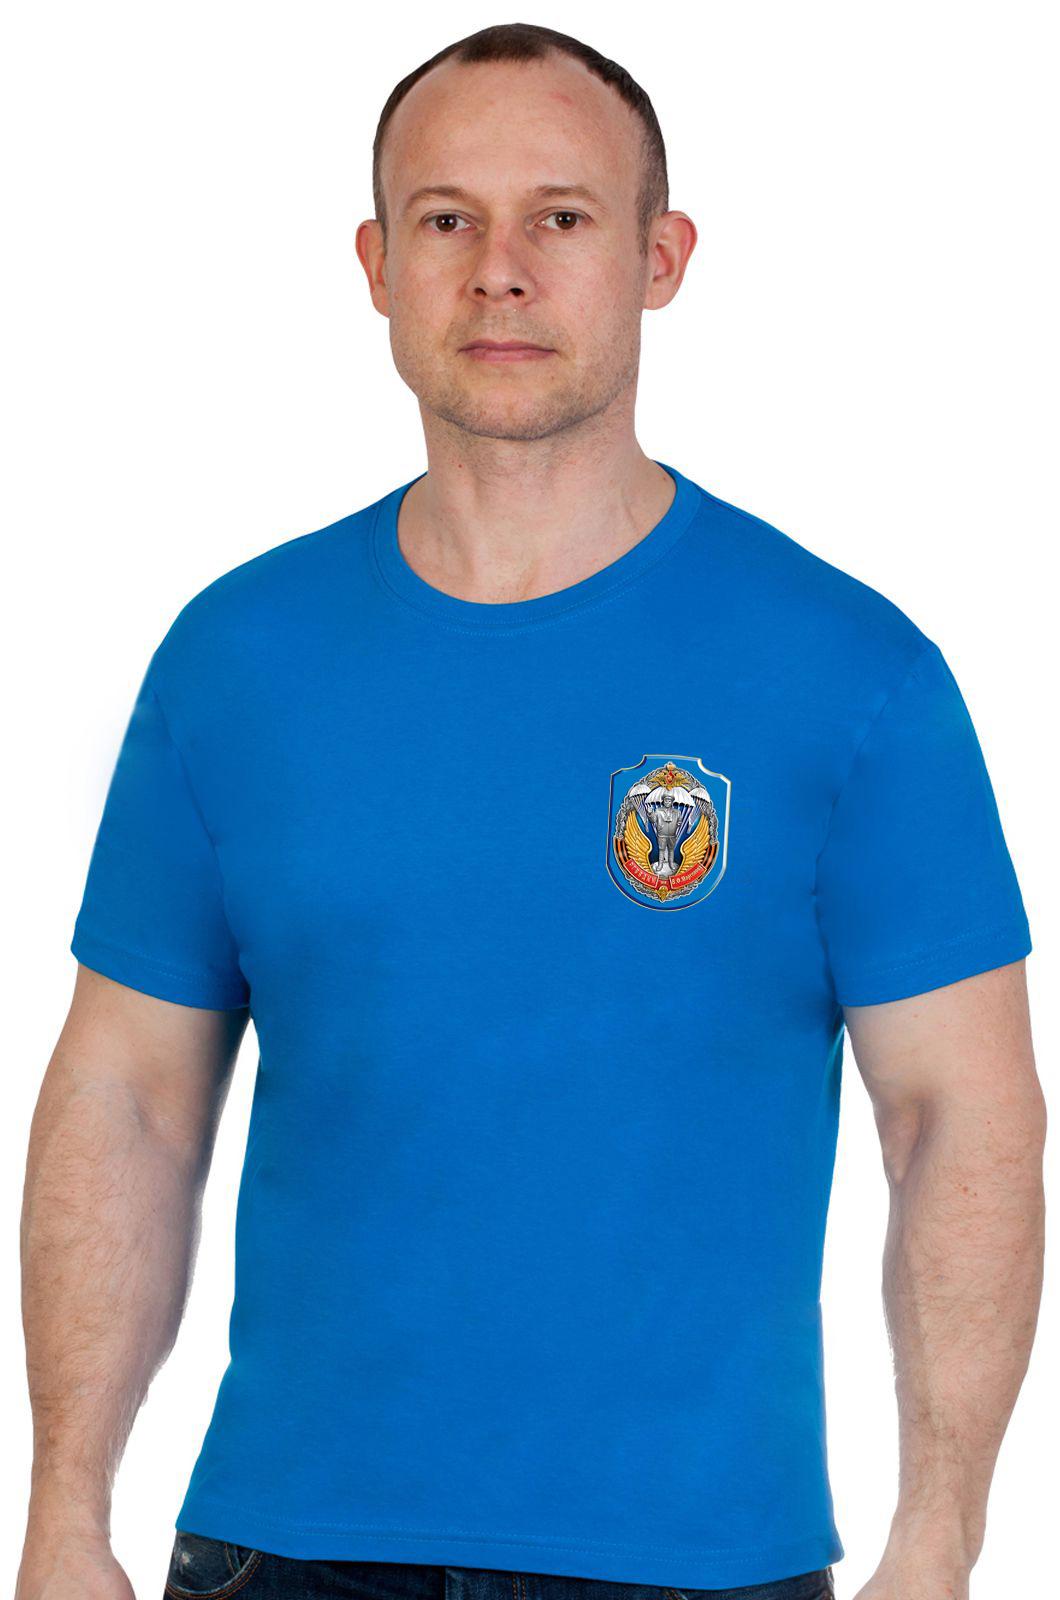 Мужские футболки по низким ценам, футболки вдв недорого